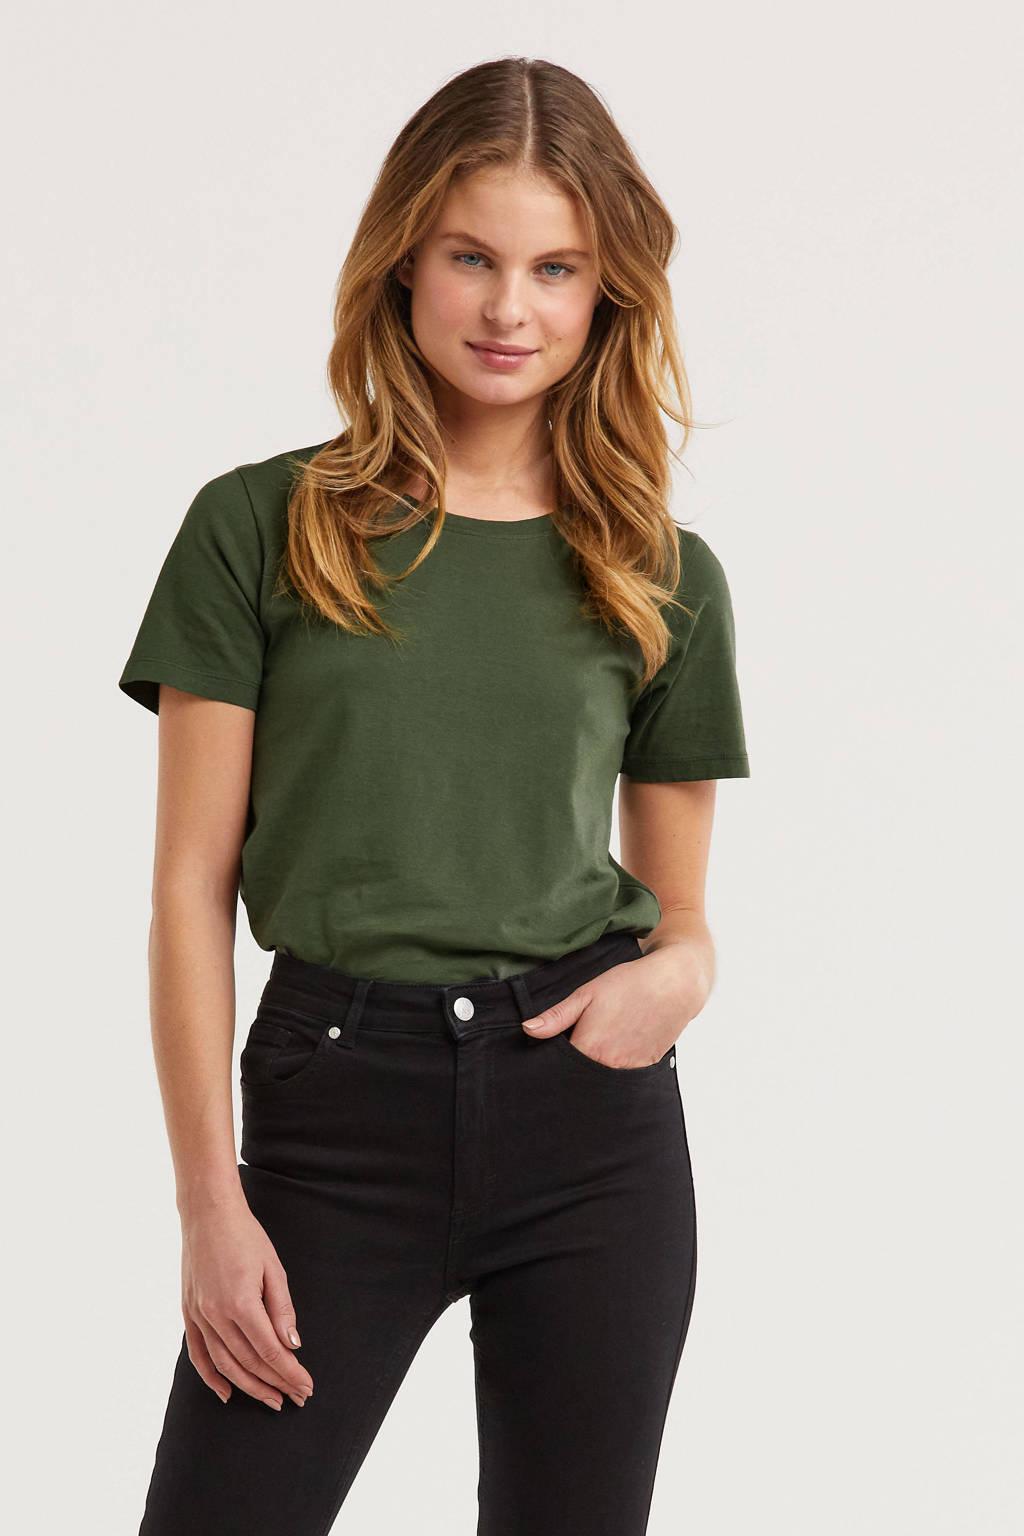 anytime T-shirt Khaki, Groen